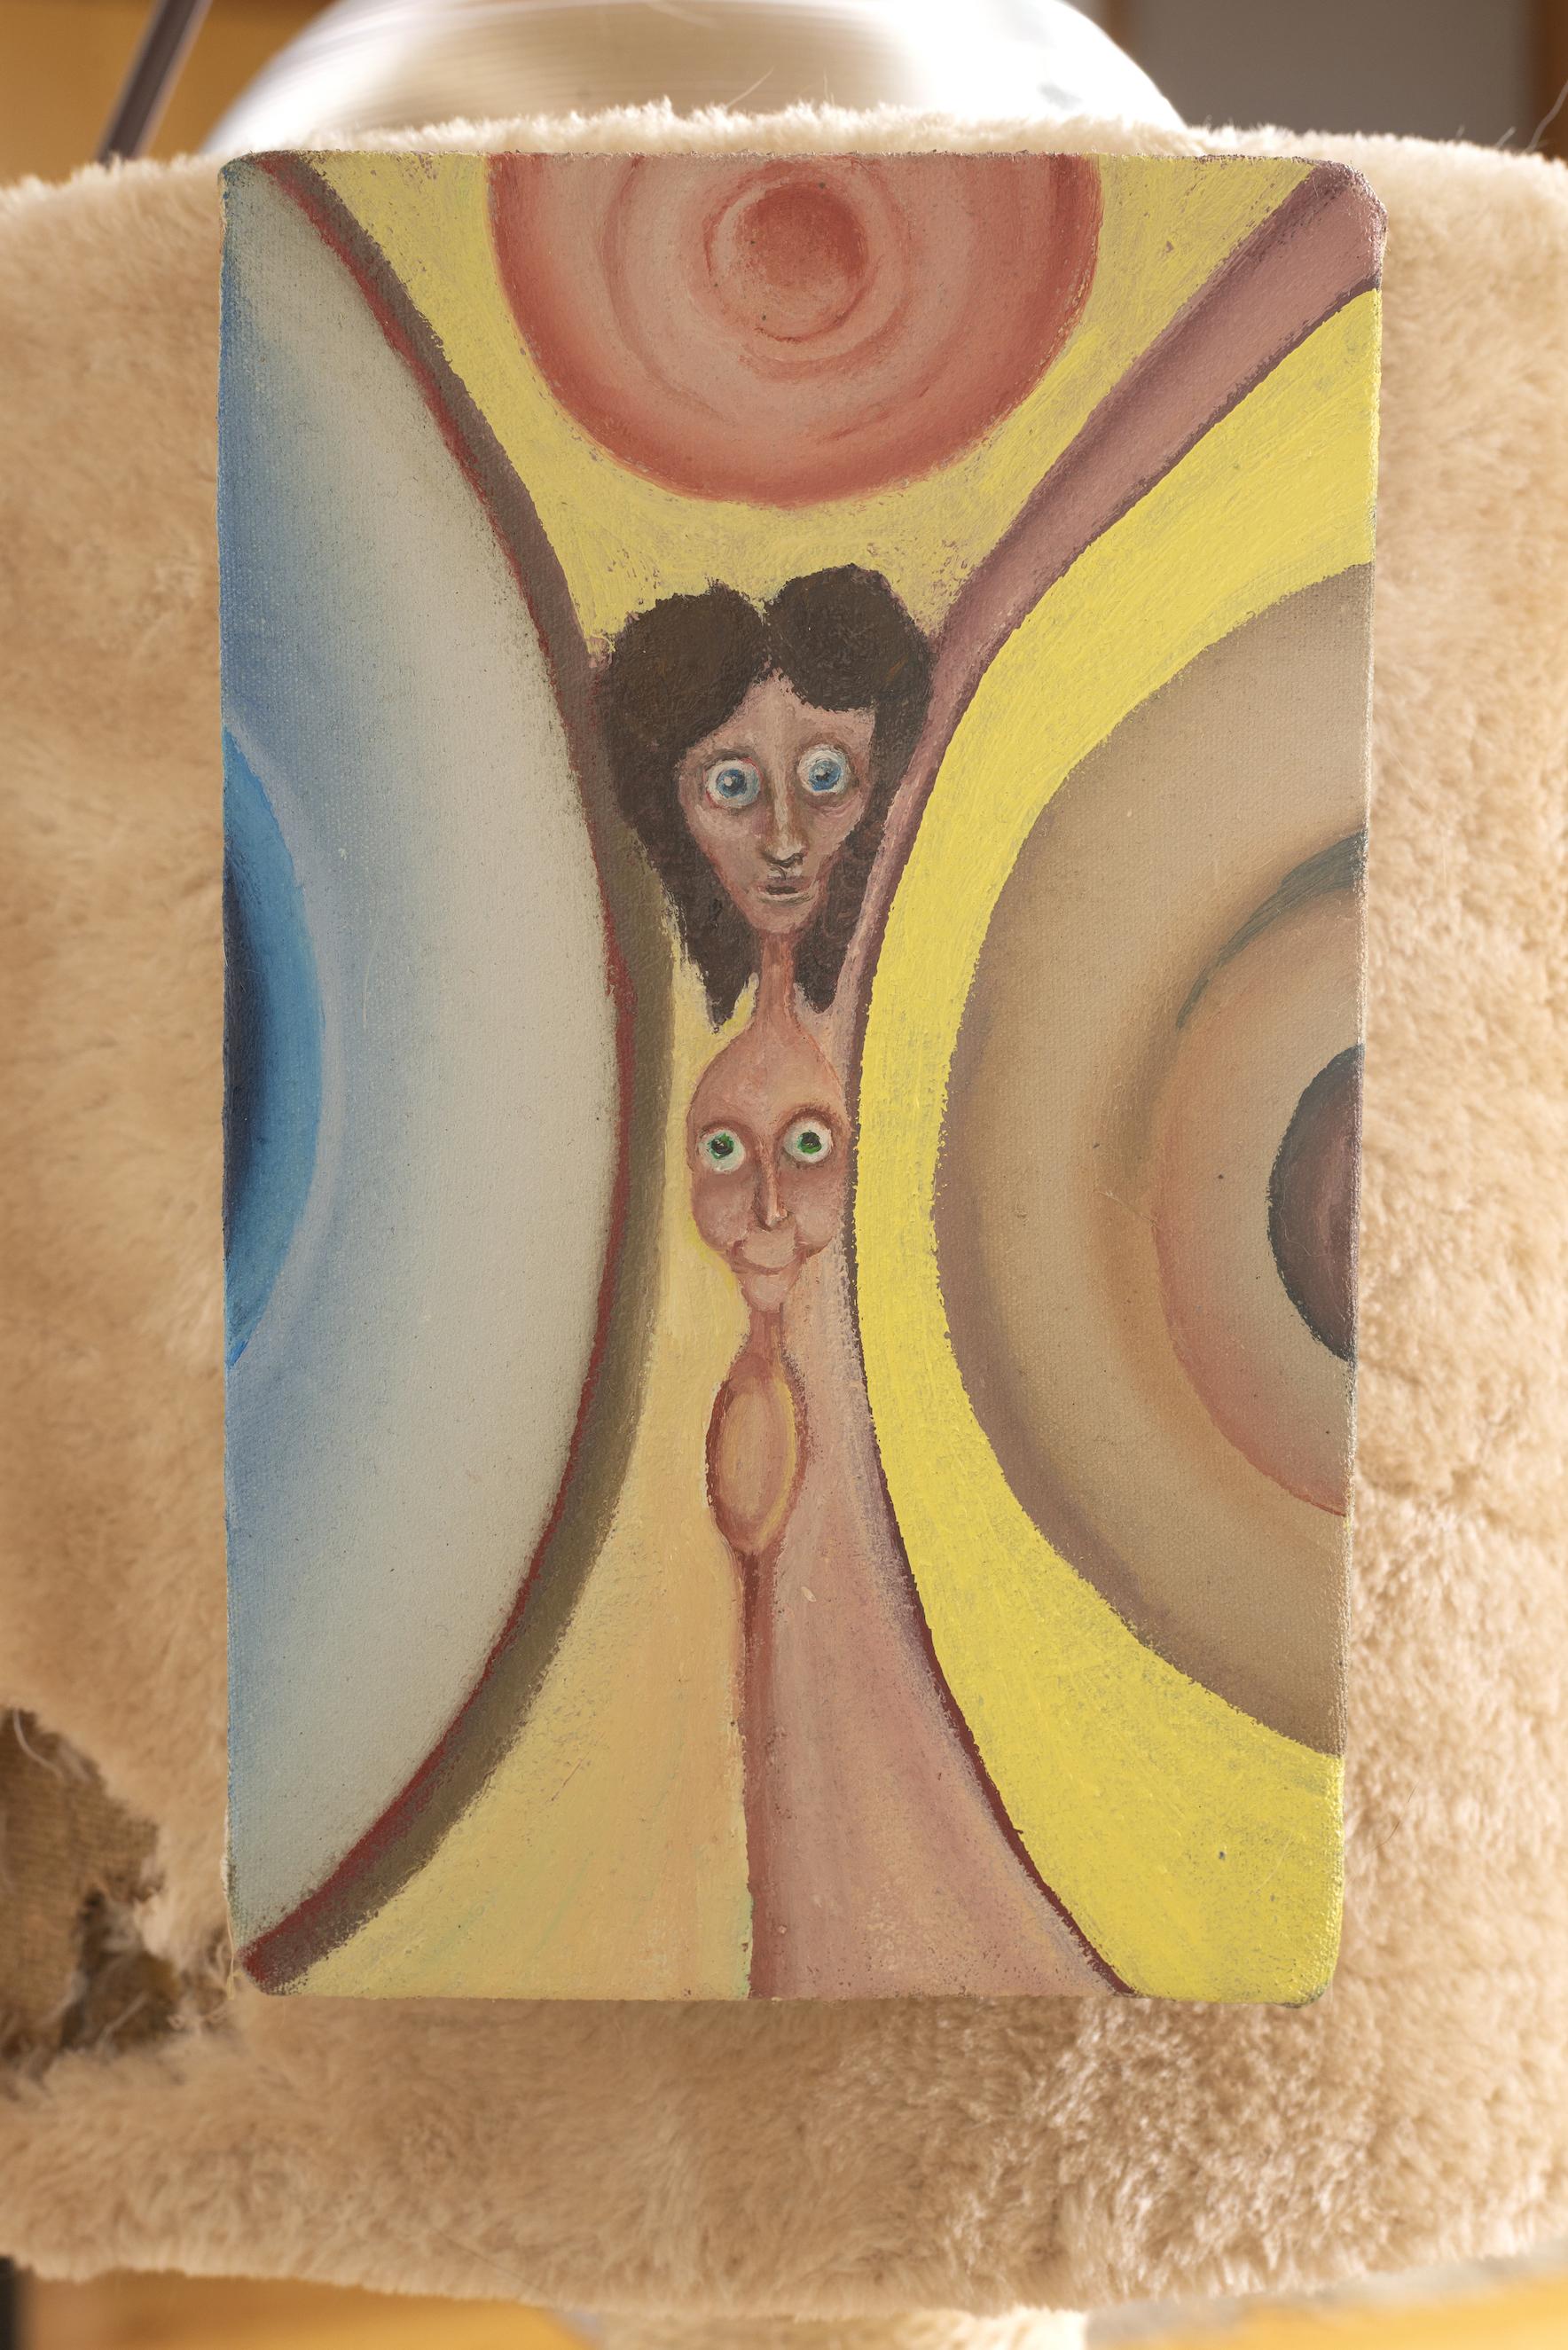 Kira Scerbin,  Inside Radiator , 2019, oil on canvas, 6 x 4 x 1 inches